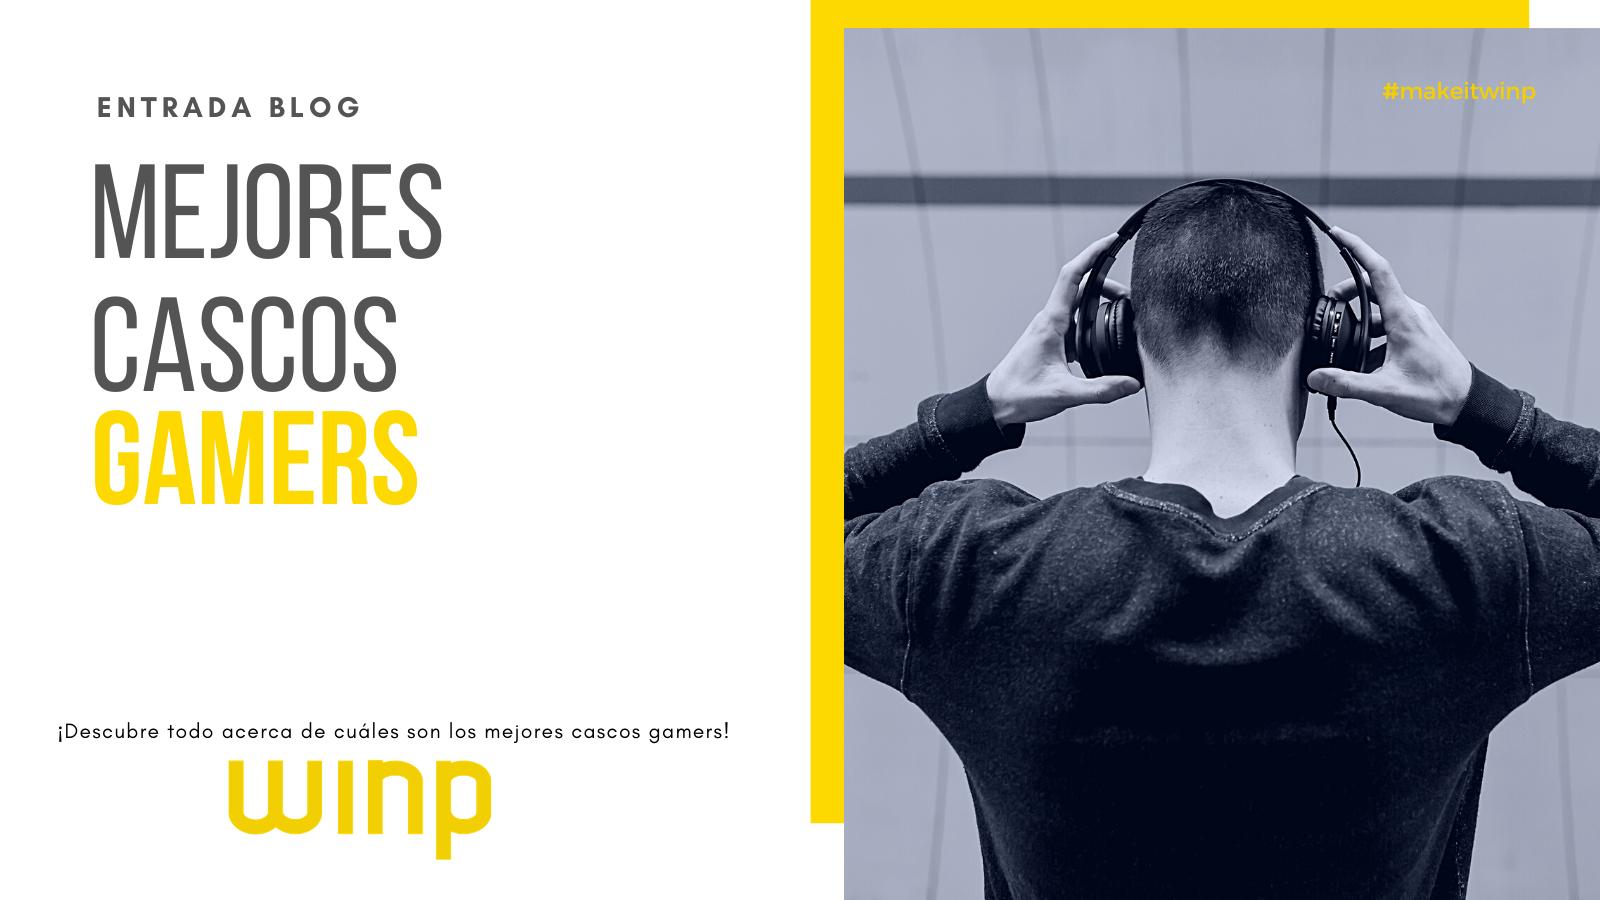 cascos gamers headphones